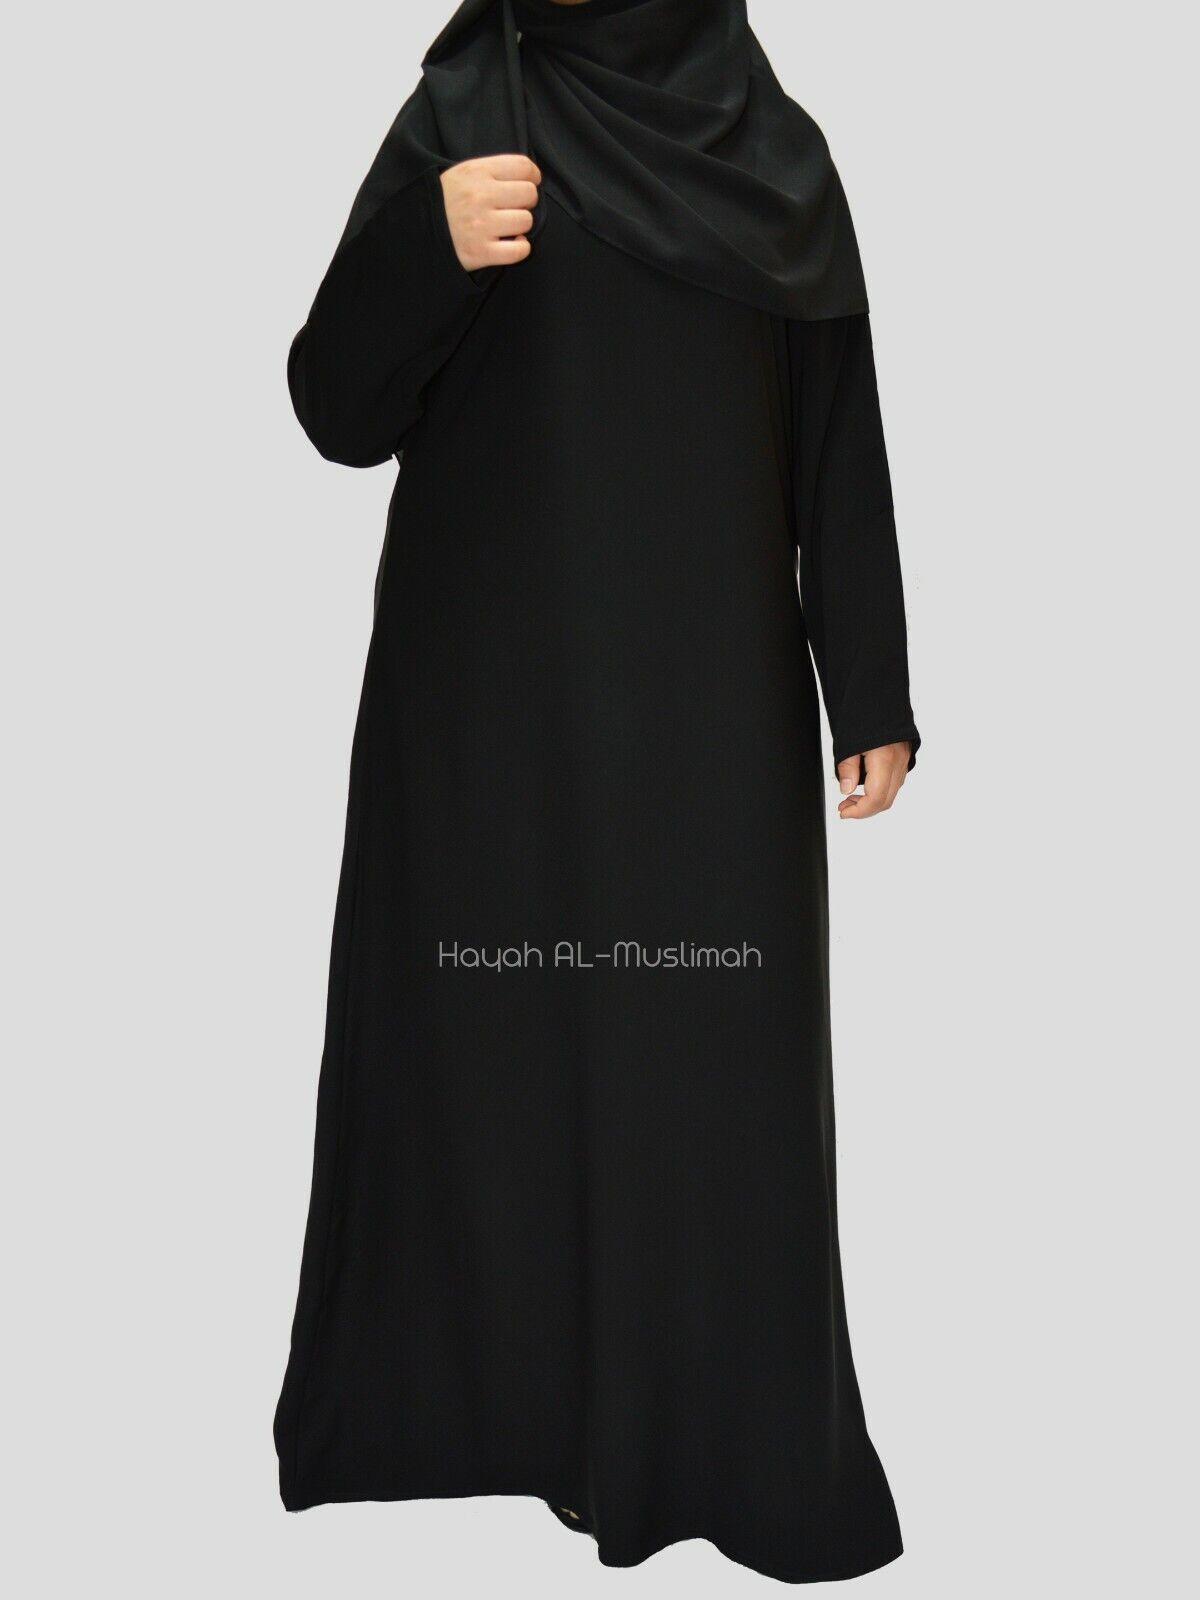 Plain Dubai Abaya / Burqa With Pocket Made by premium soft Nida fabric in Dubai